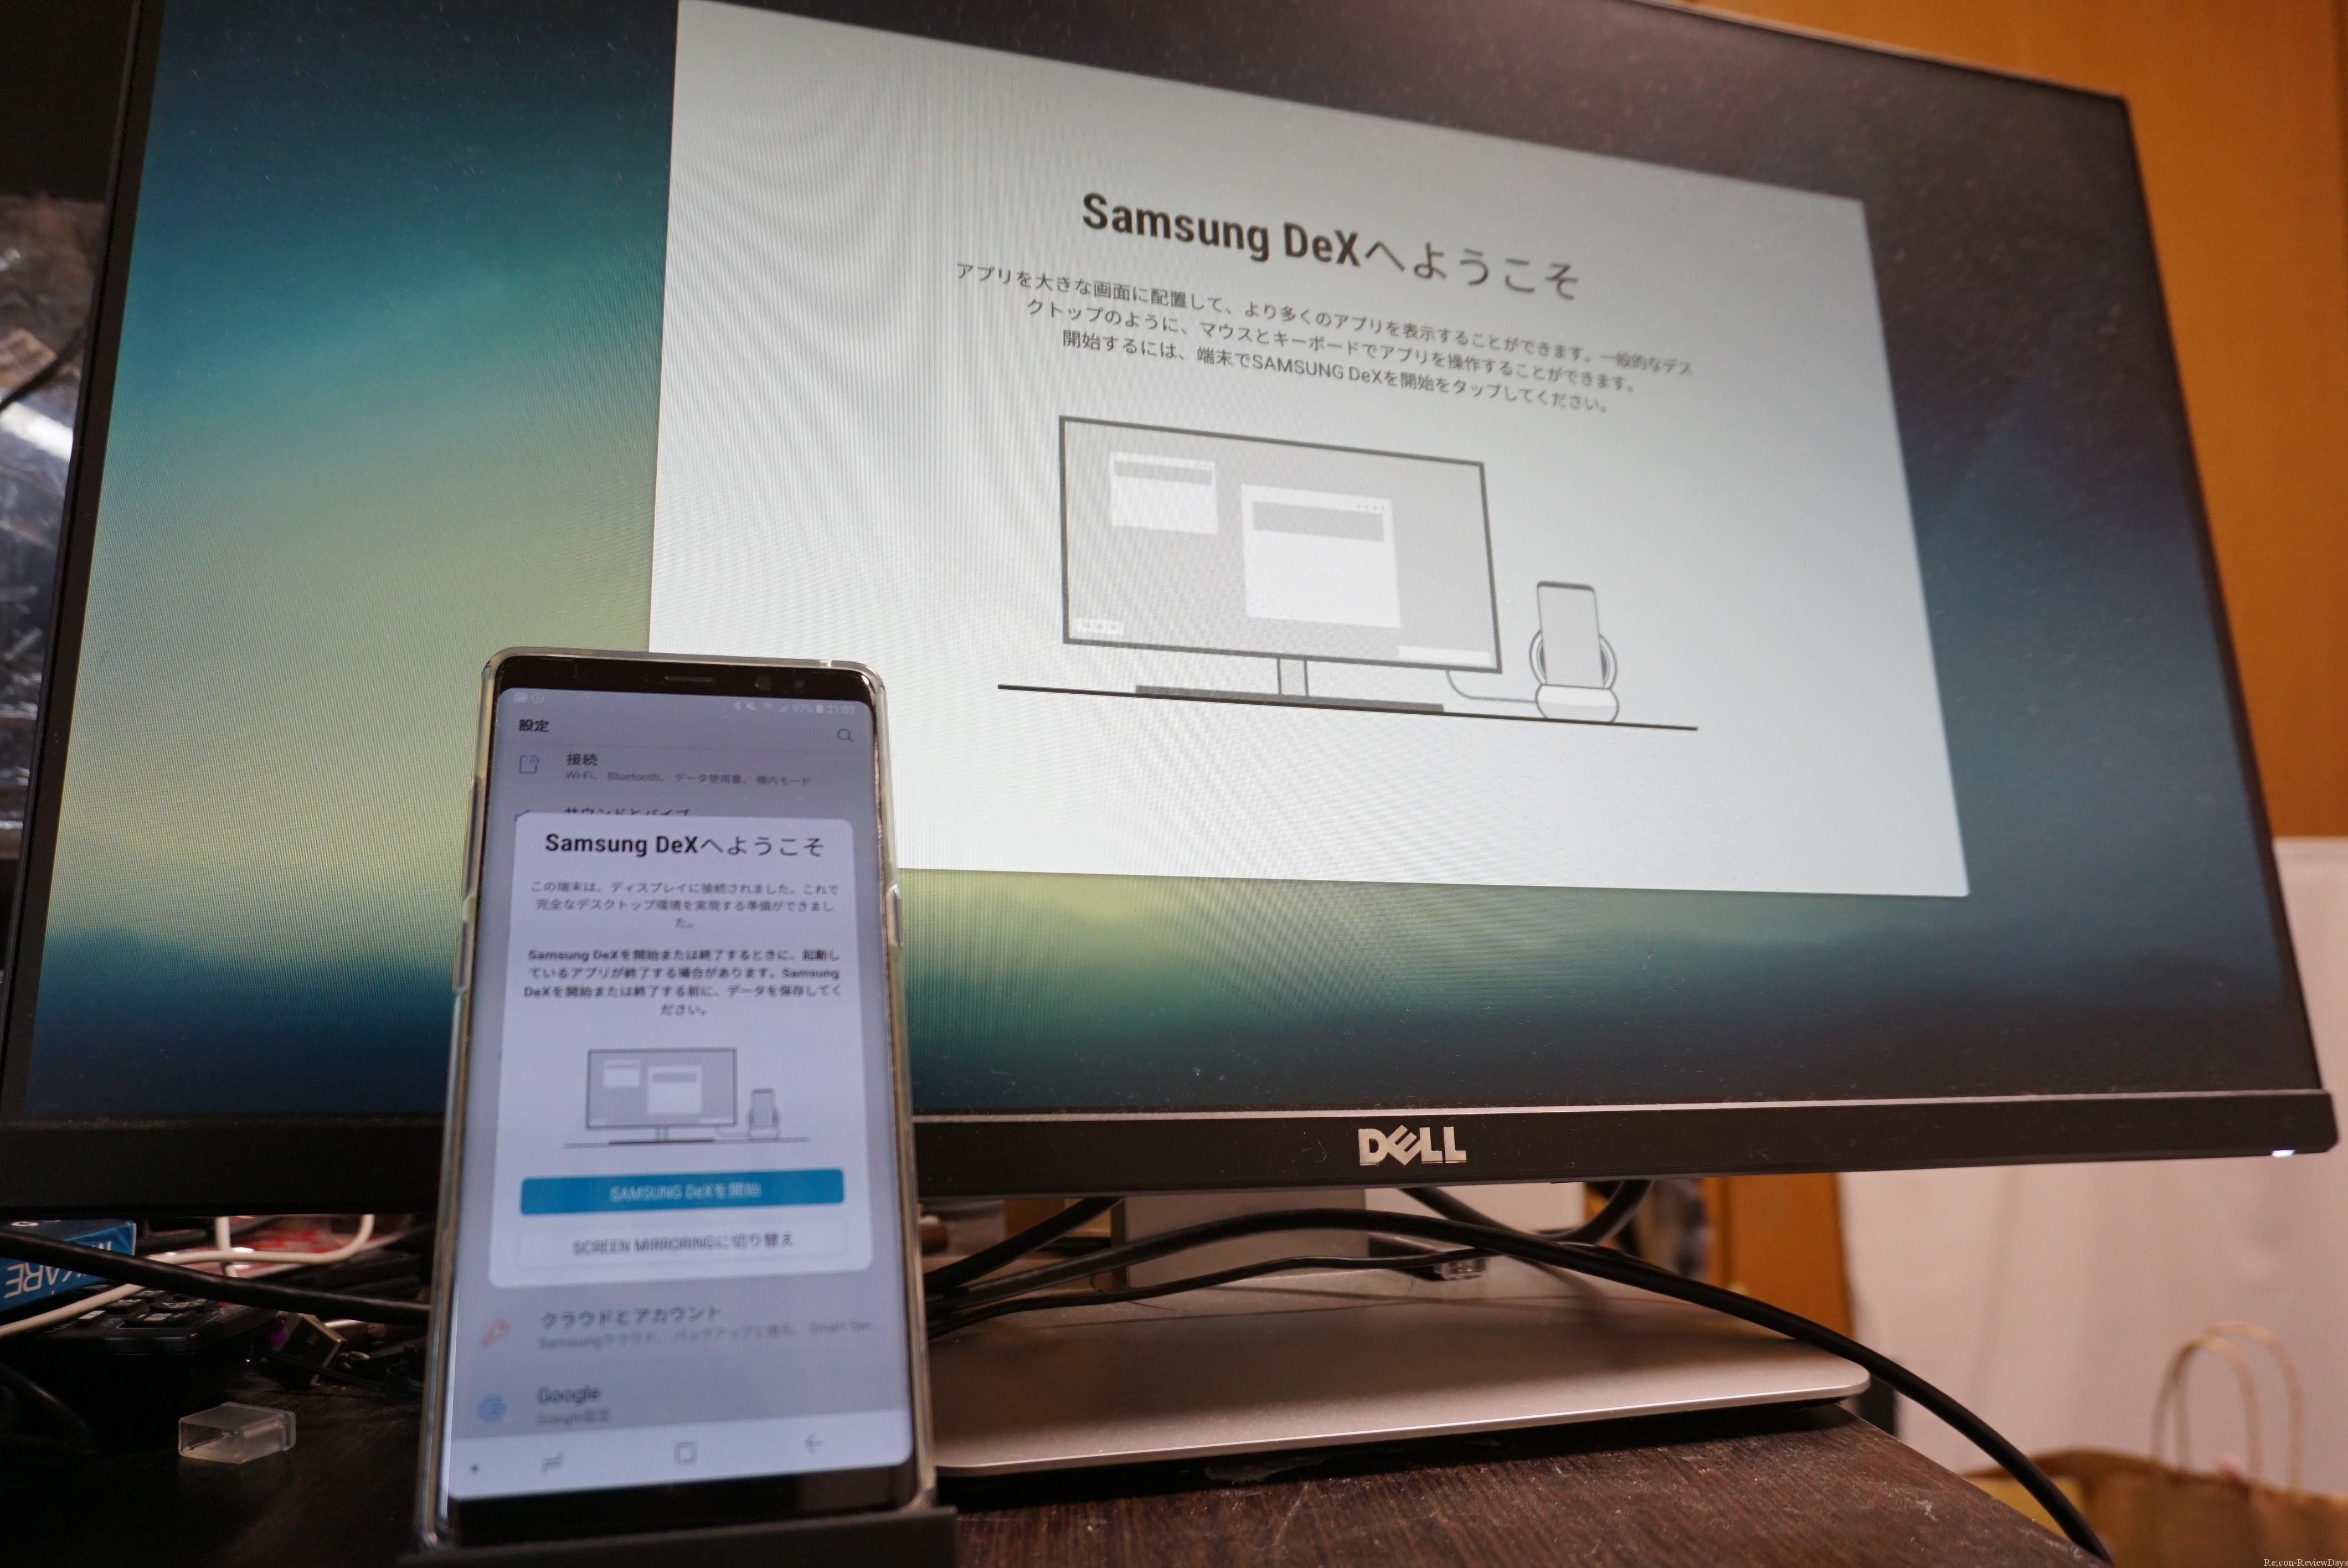 Samsung DeX Stationの互換を持つ安価なドッキングステーション「SMOS Dex Station(KZW-001)」の外観をチェックする #Samsung #S8 #Note8